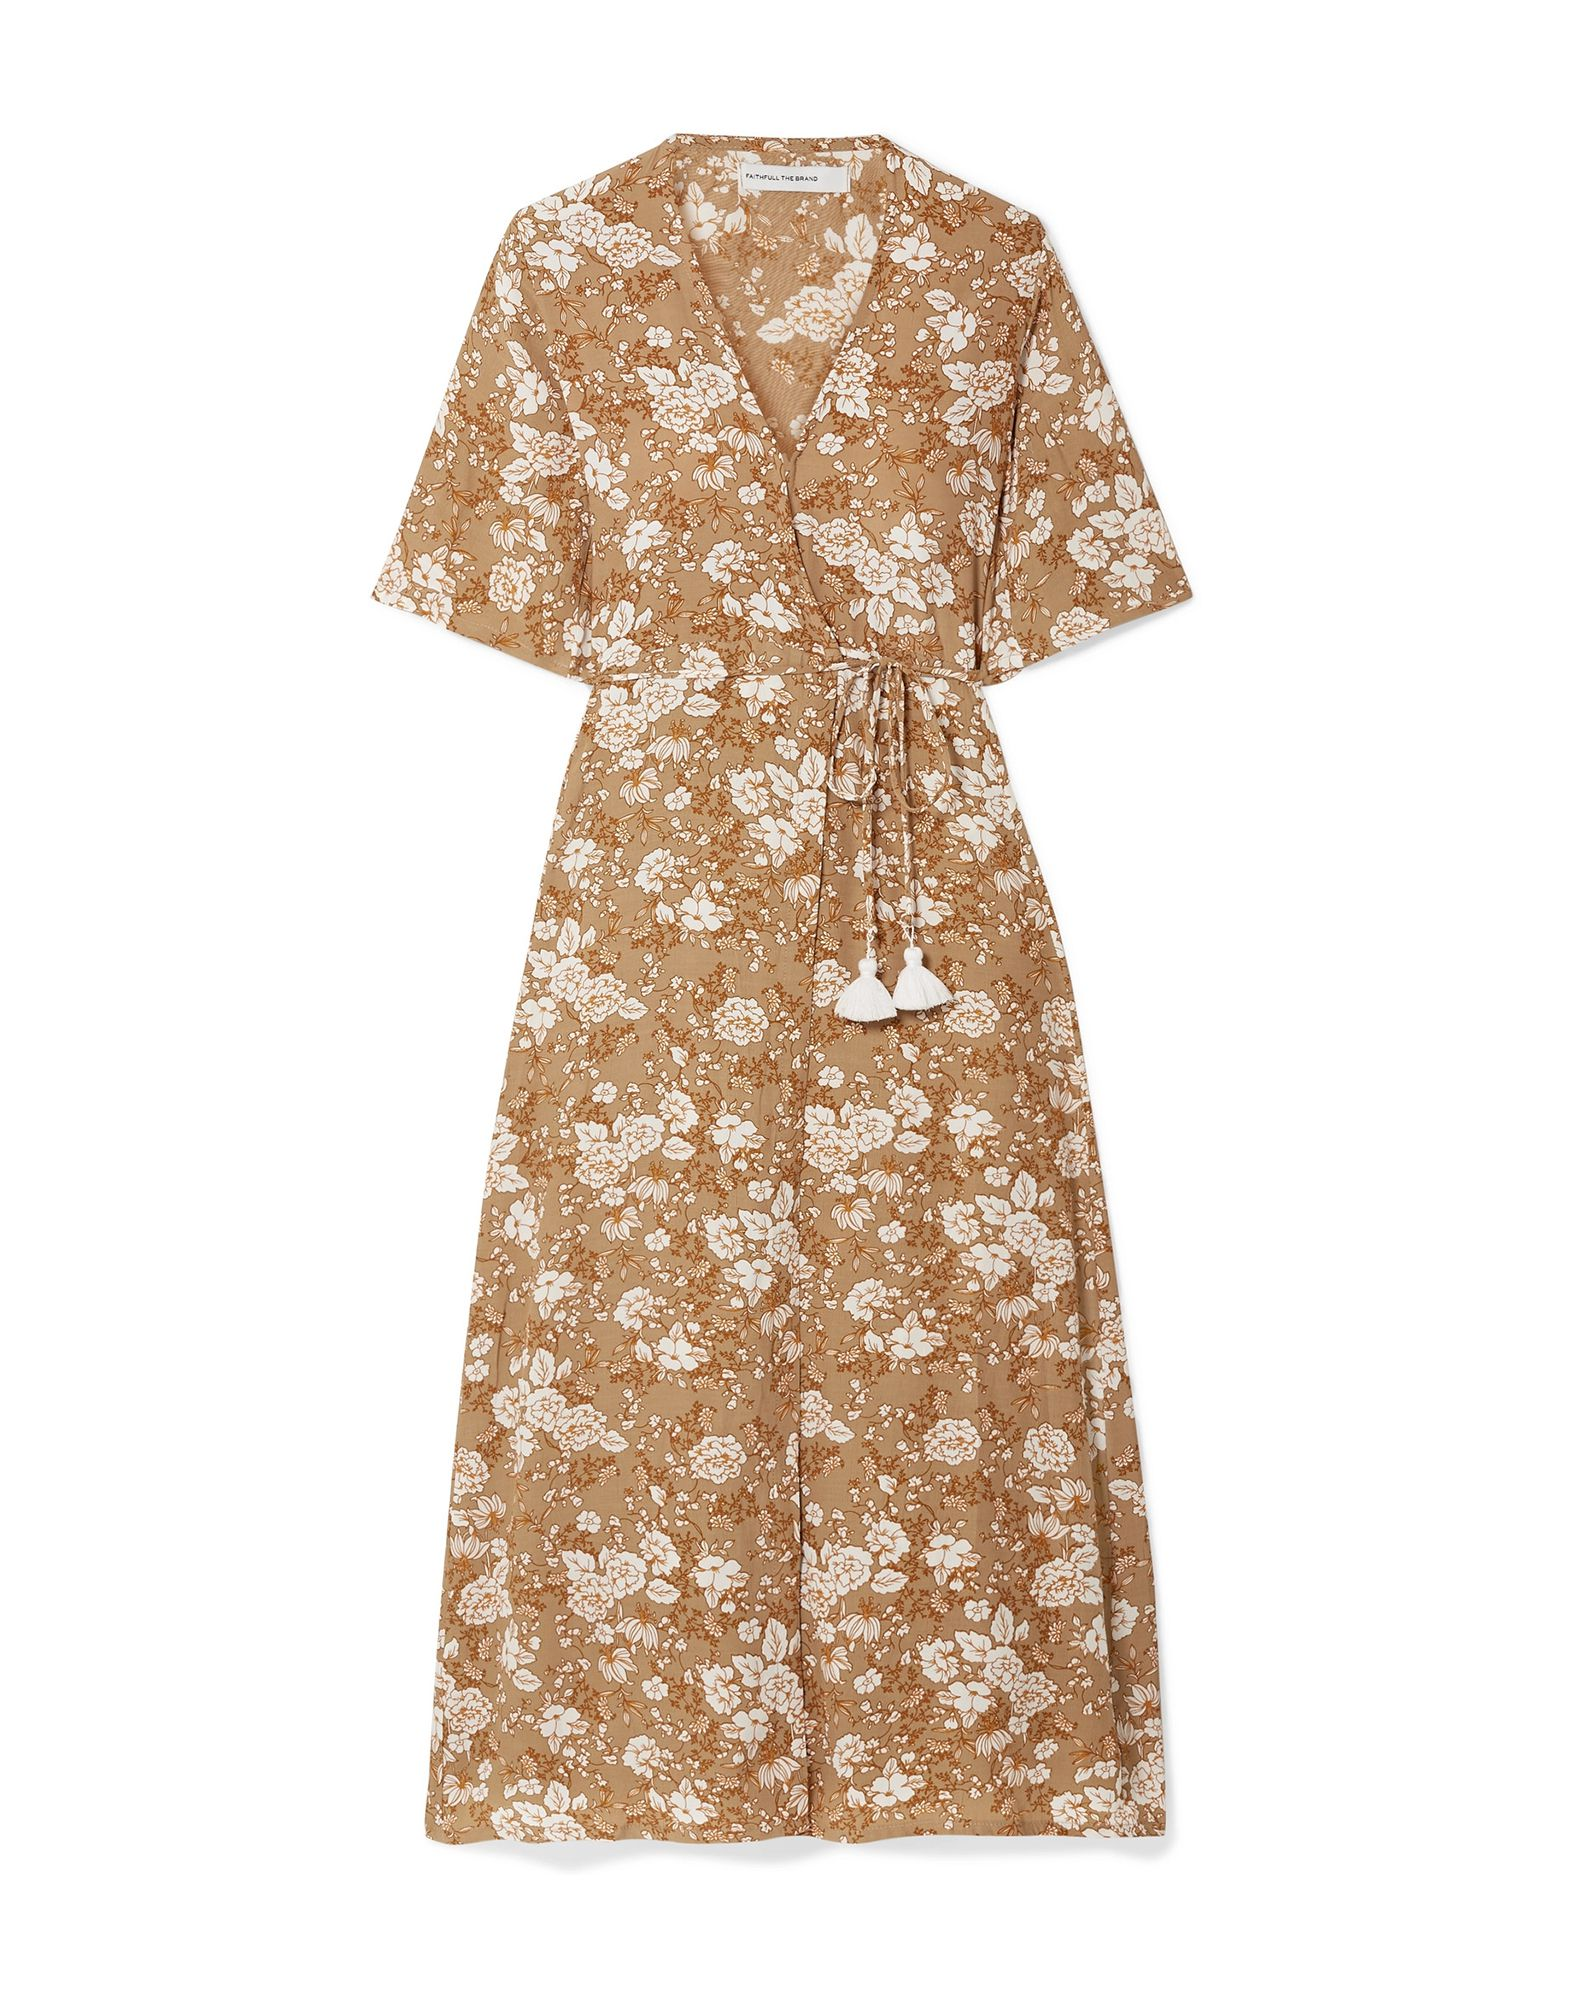 FAITHFULL THE BRAND Платье длиной 3/4